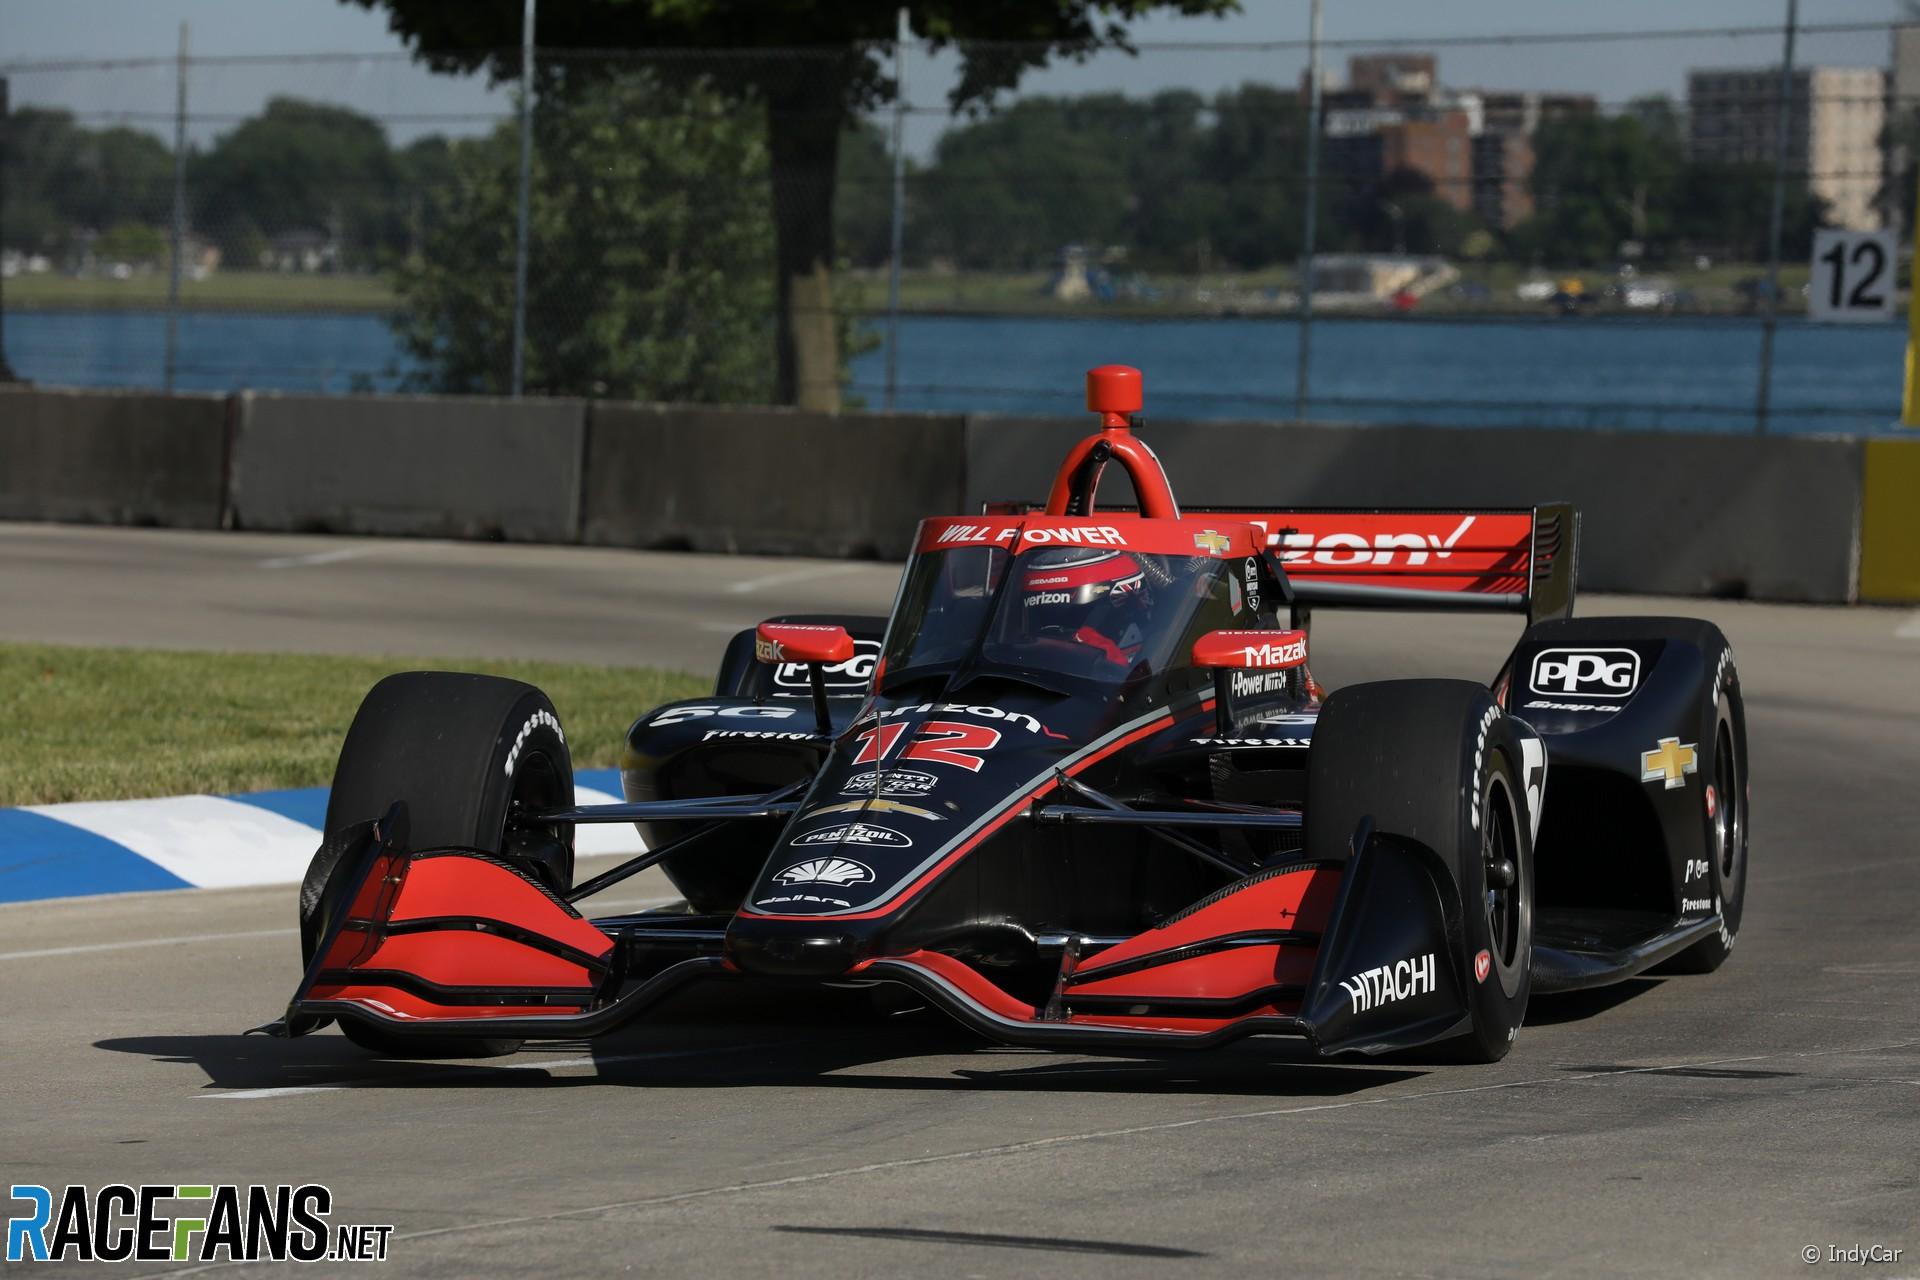 Power Explodes At Indycar Race Control After Ecu Failure Costs Him Detroit Win Racefans